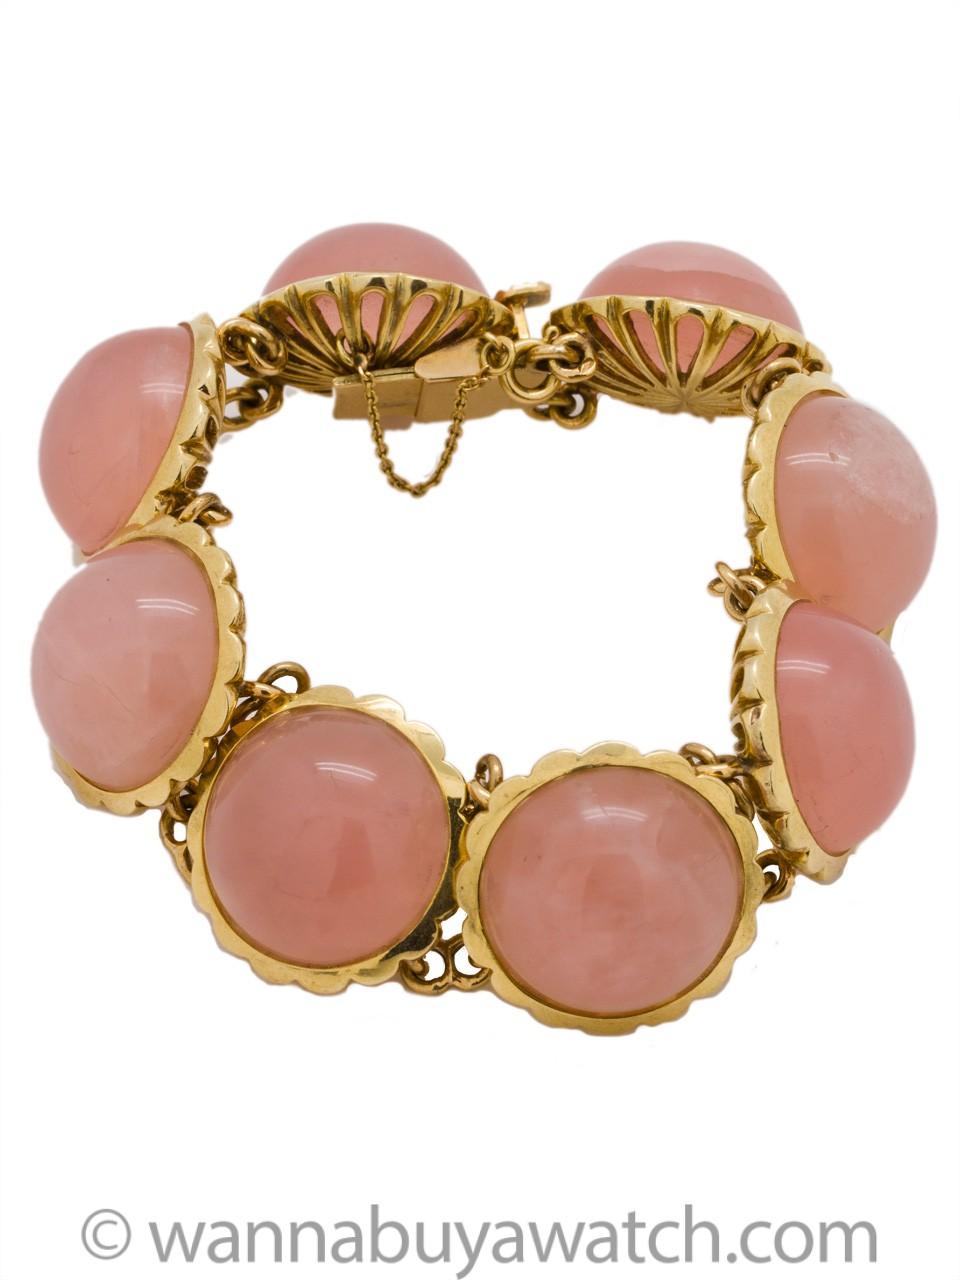 Rose Quartz & 14K YG Bracelet circa 1970's